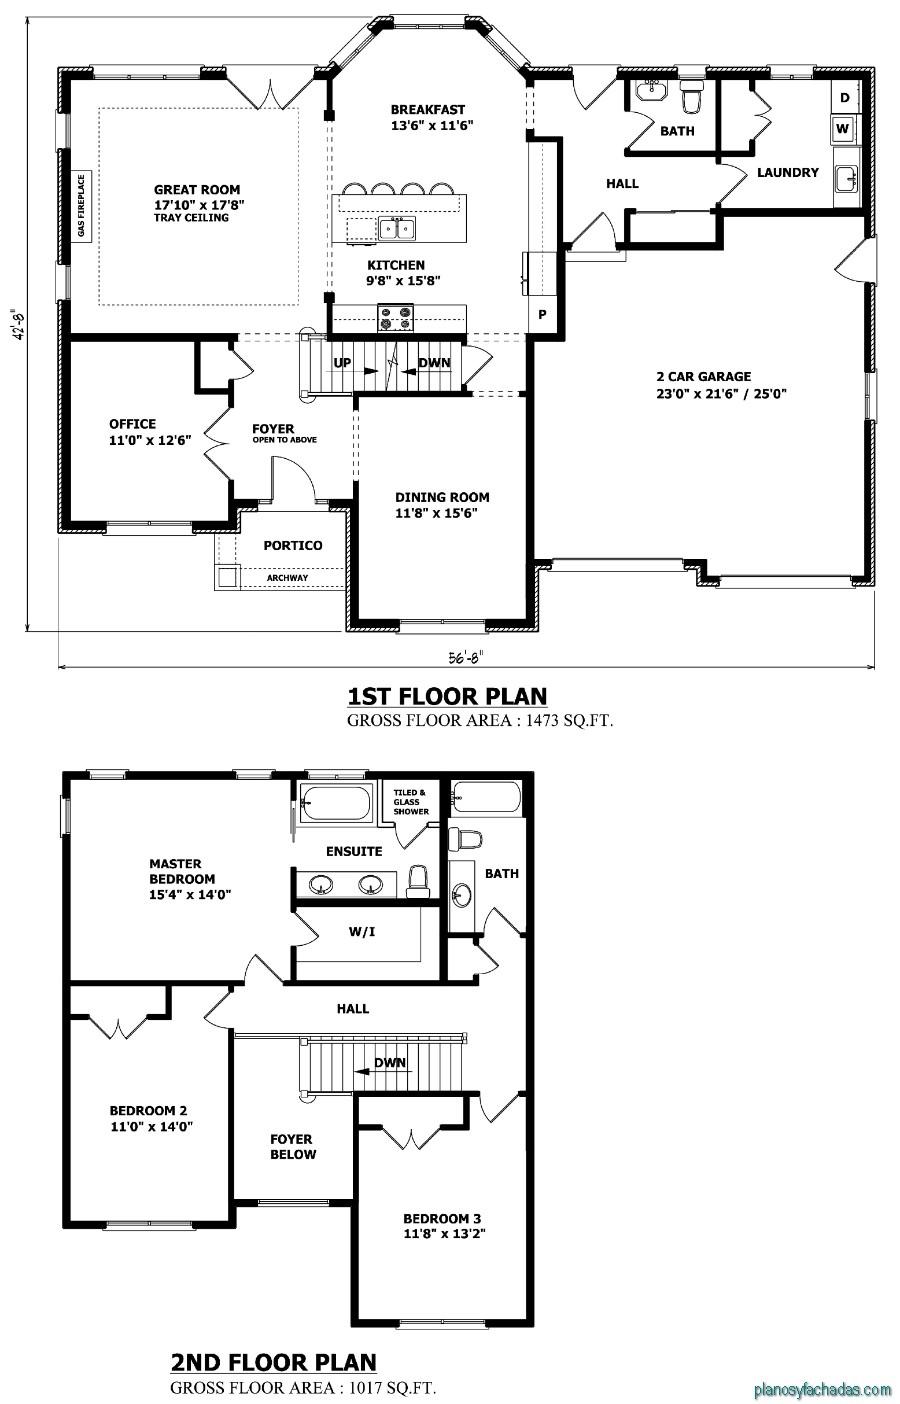 15 planos de casas peque as de dos pisos planos y - Planos de casas pareadas ...